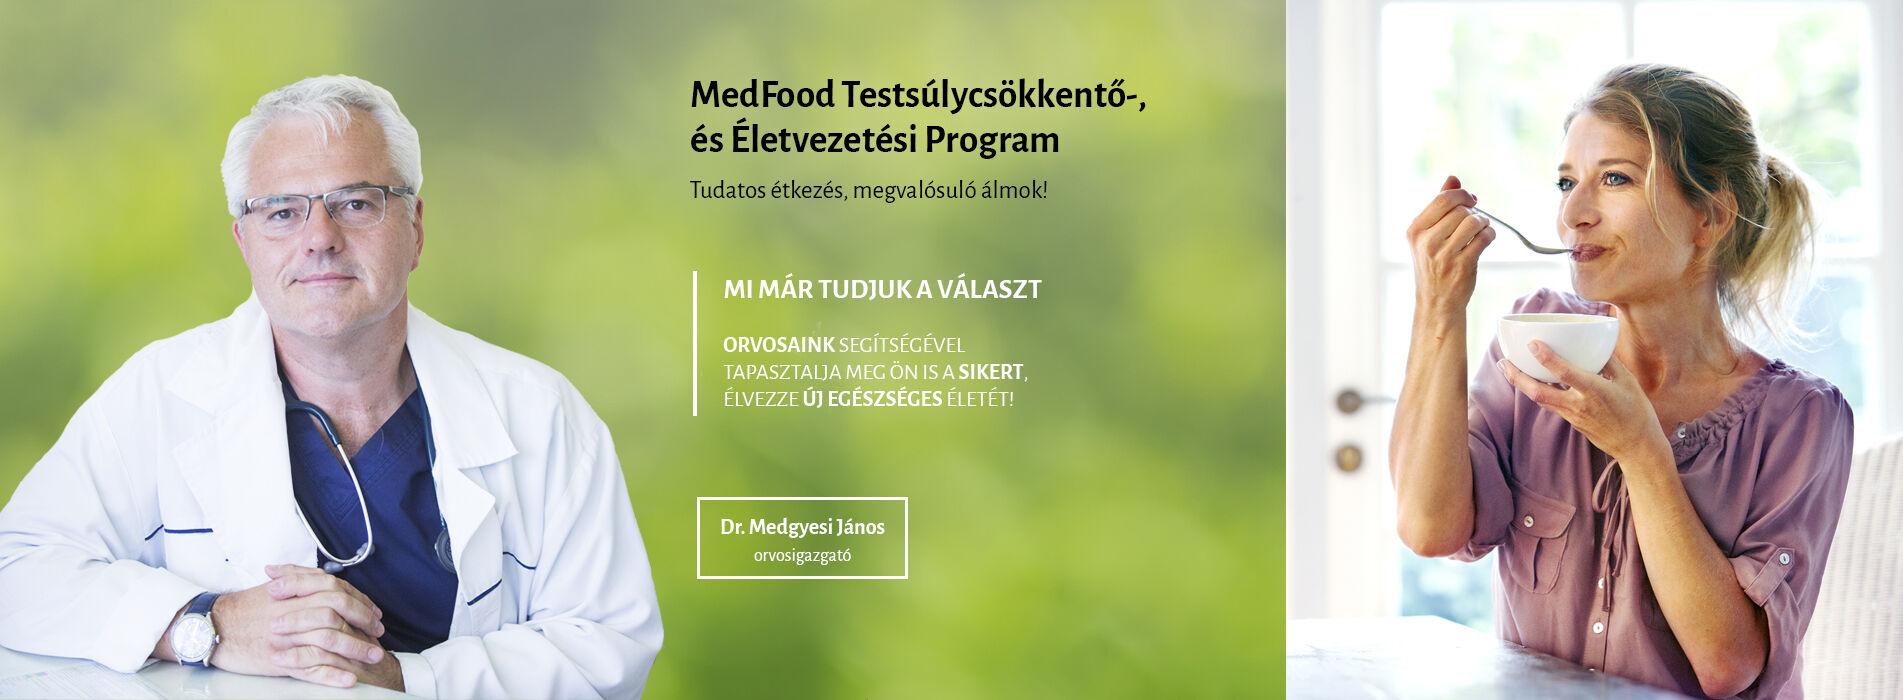 MedFood